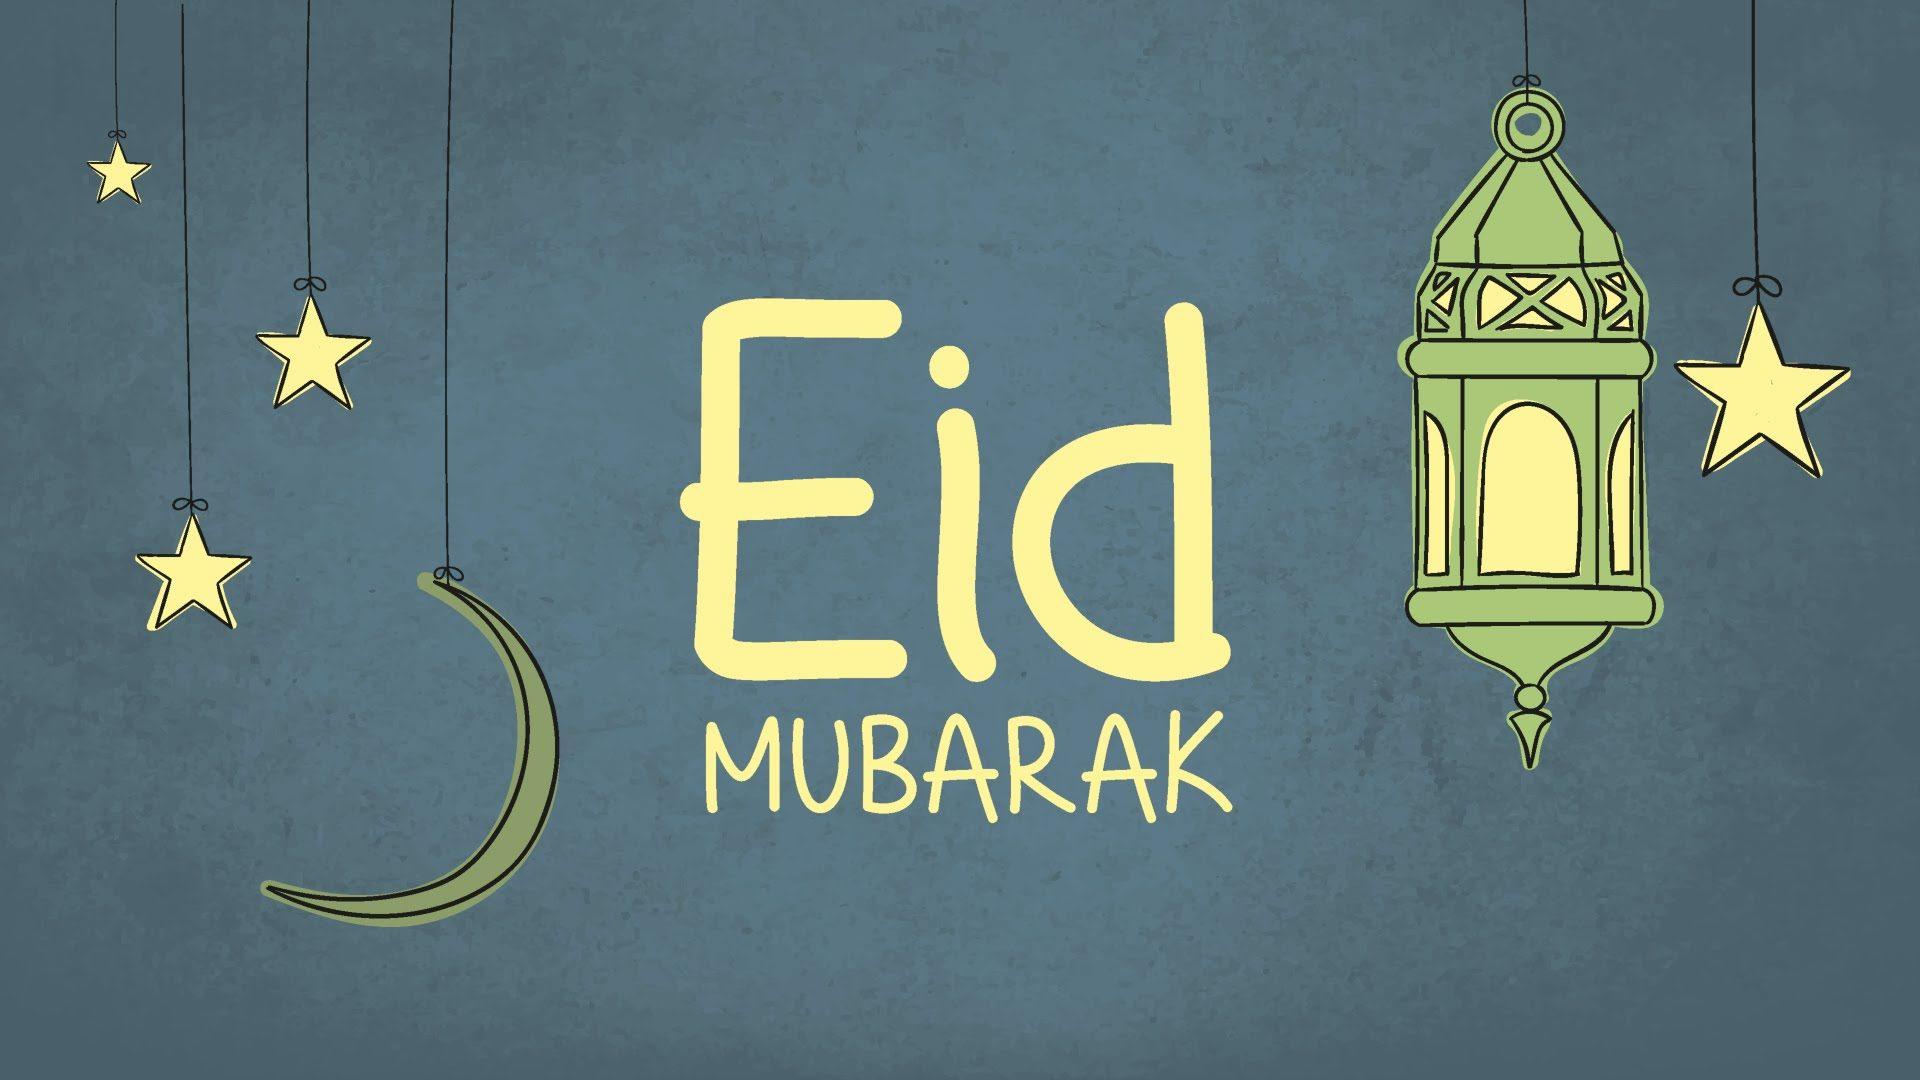 eid mubarak images and pics